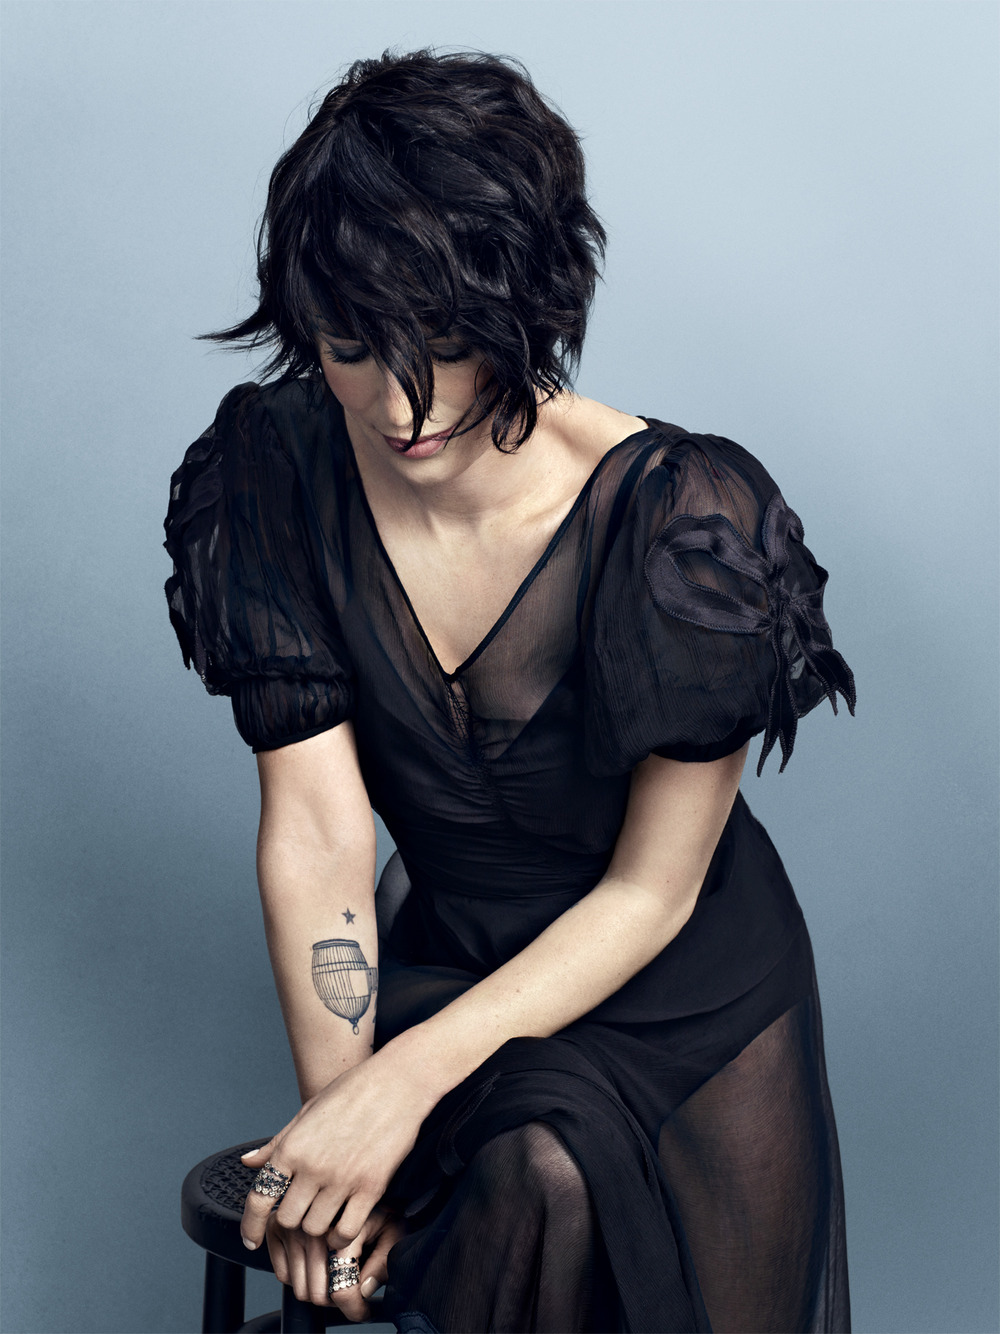 More Magazine November 2014 Issue: Game Of Thrones' Lena Headey Stuns On MORE Magazine Cover